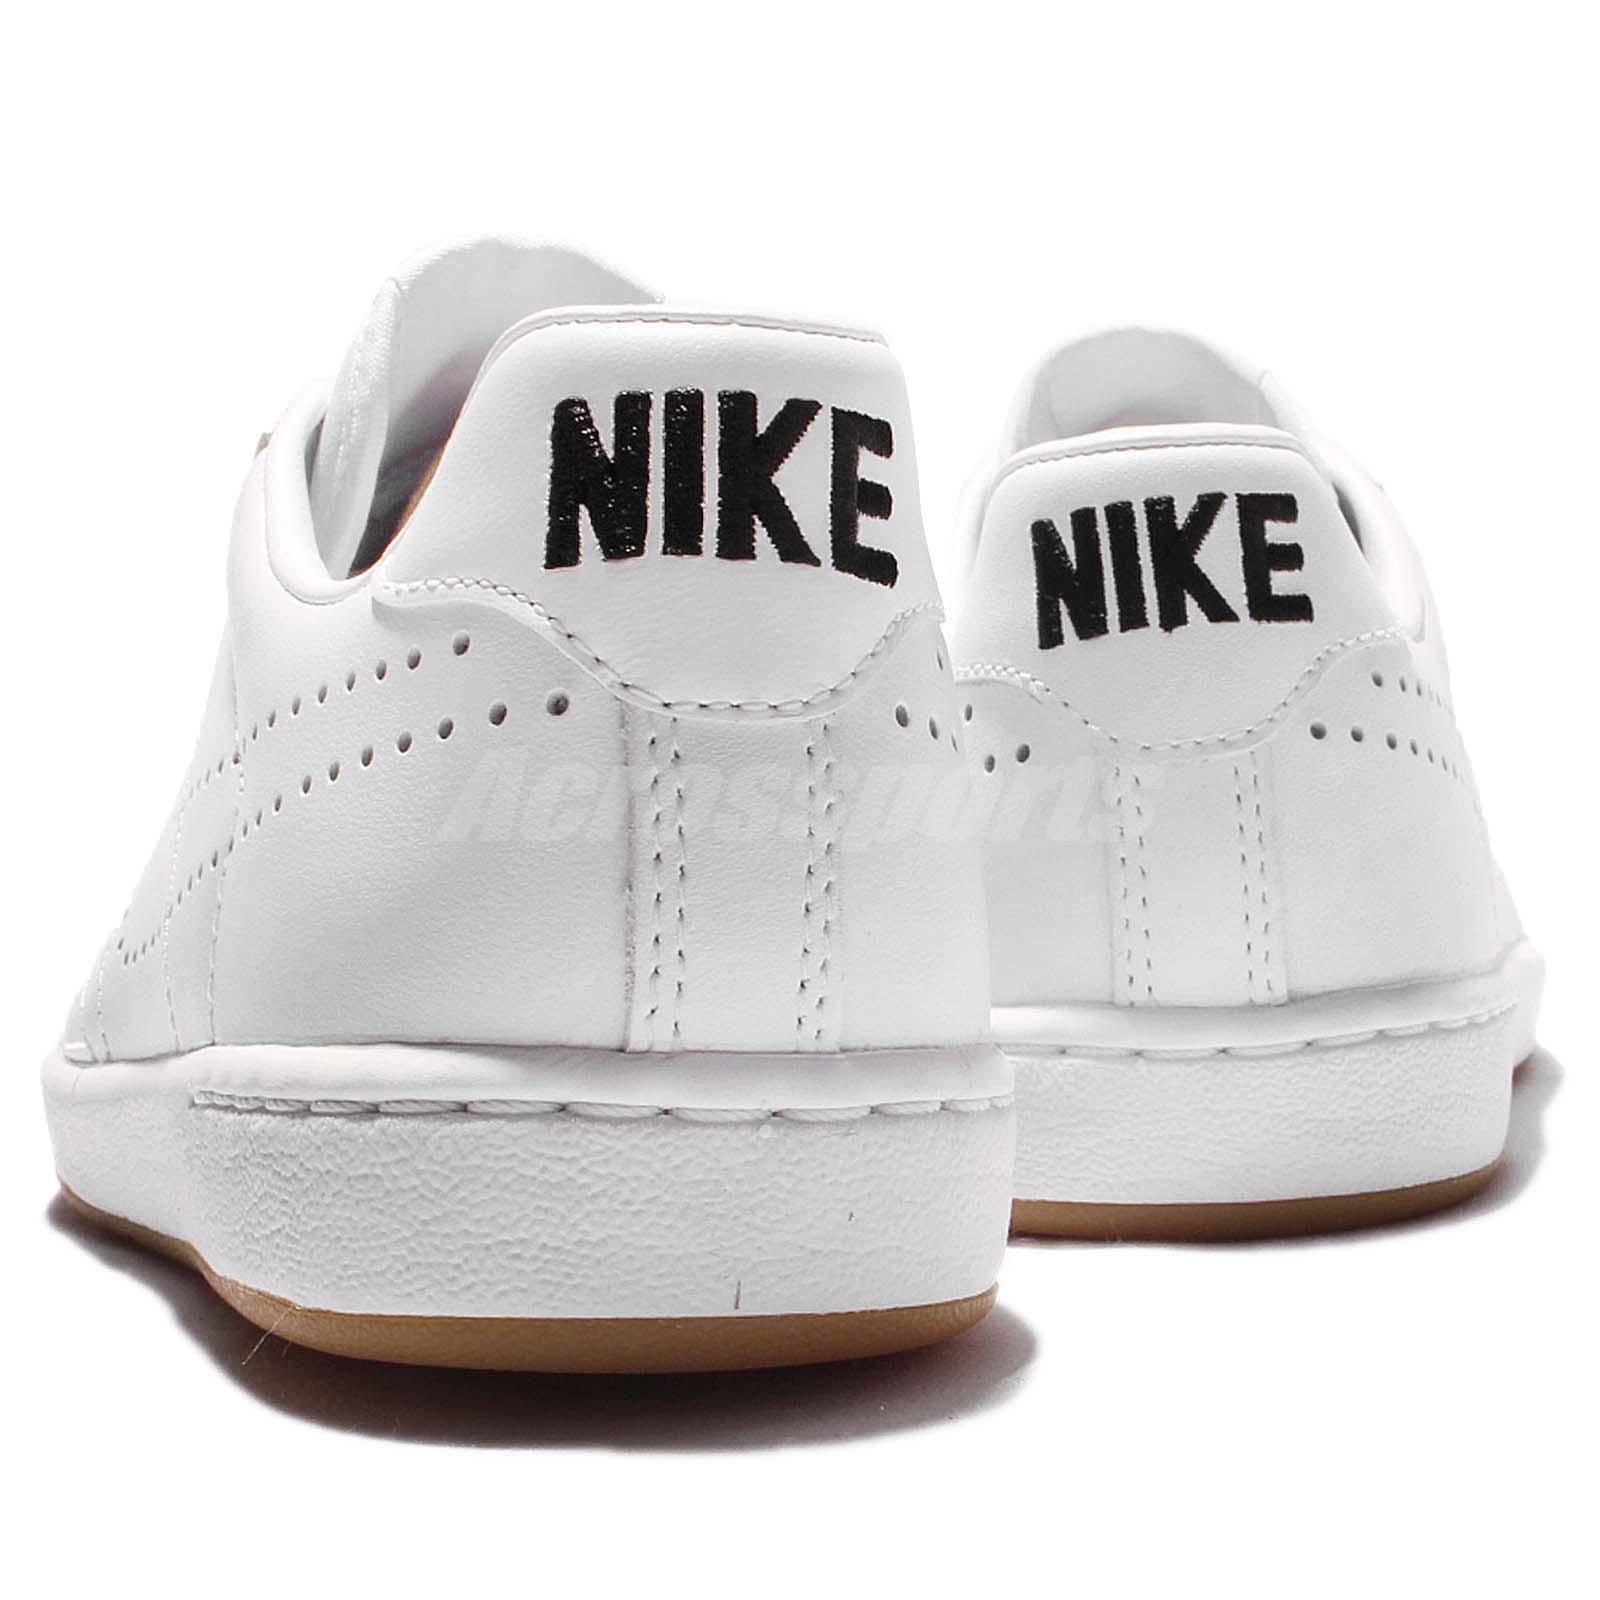 quality design d7e35 26076 Wmns Nike Tennis Classic Ultra LTHR Leather White Gum Womens Shoes ...